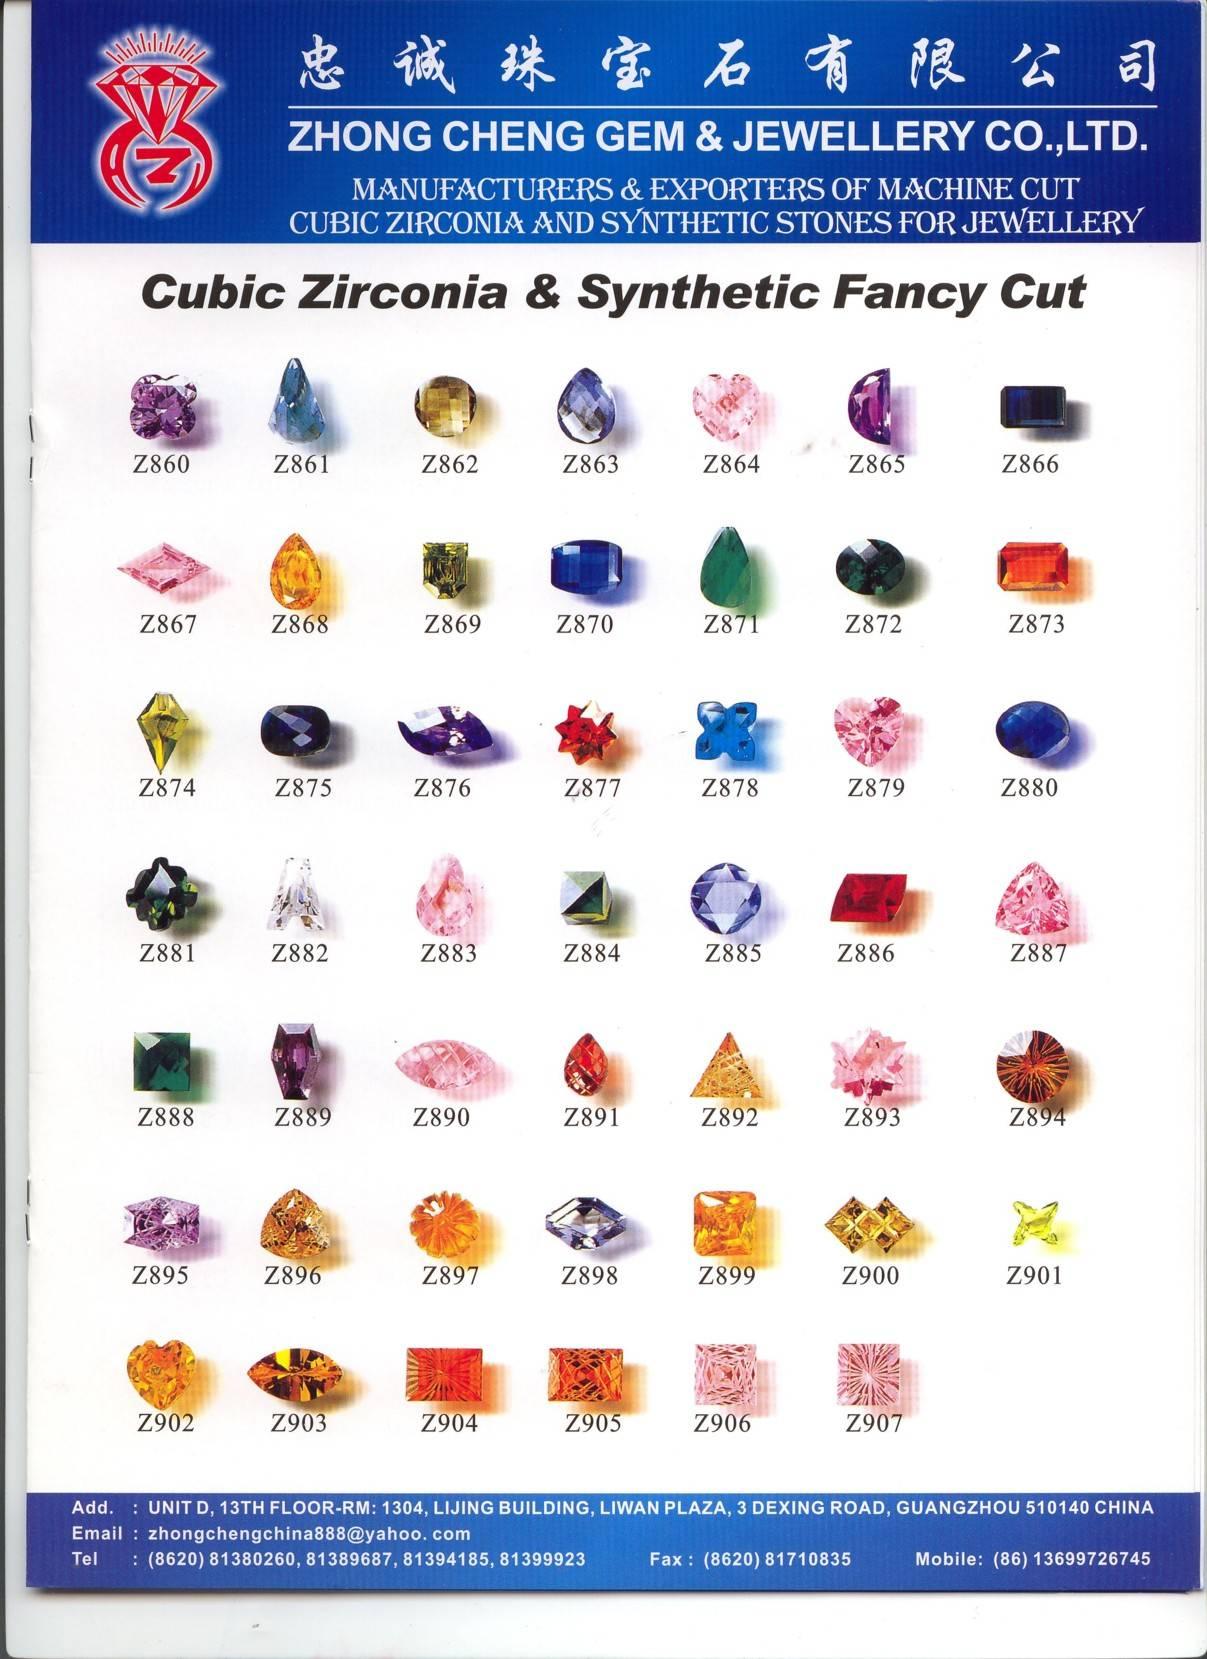 Cubic Zirconia, Synthetic